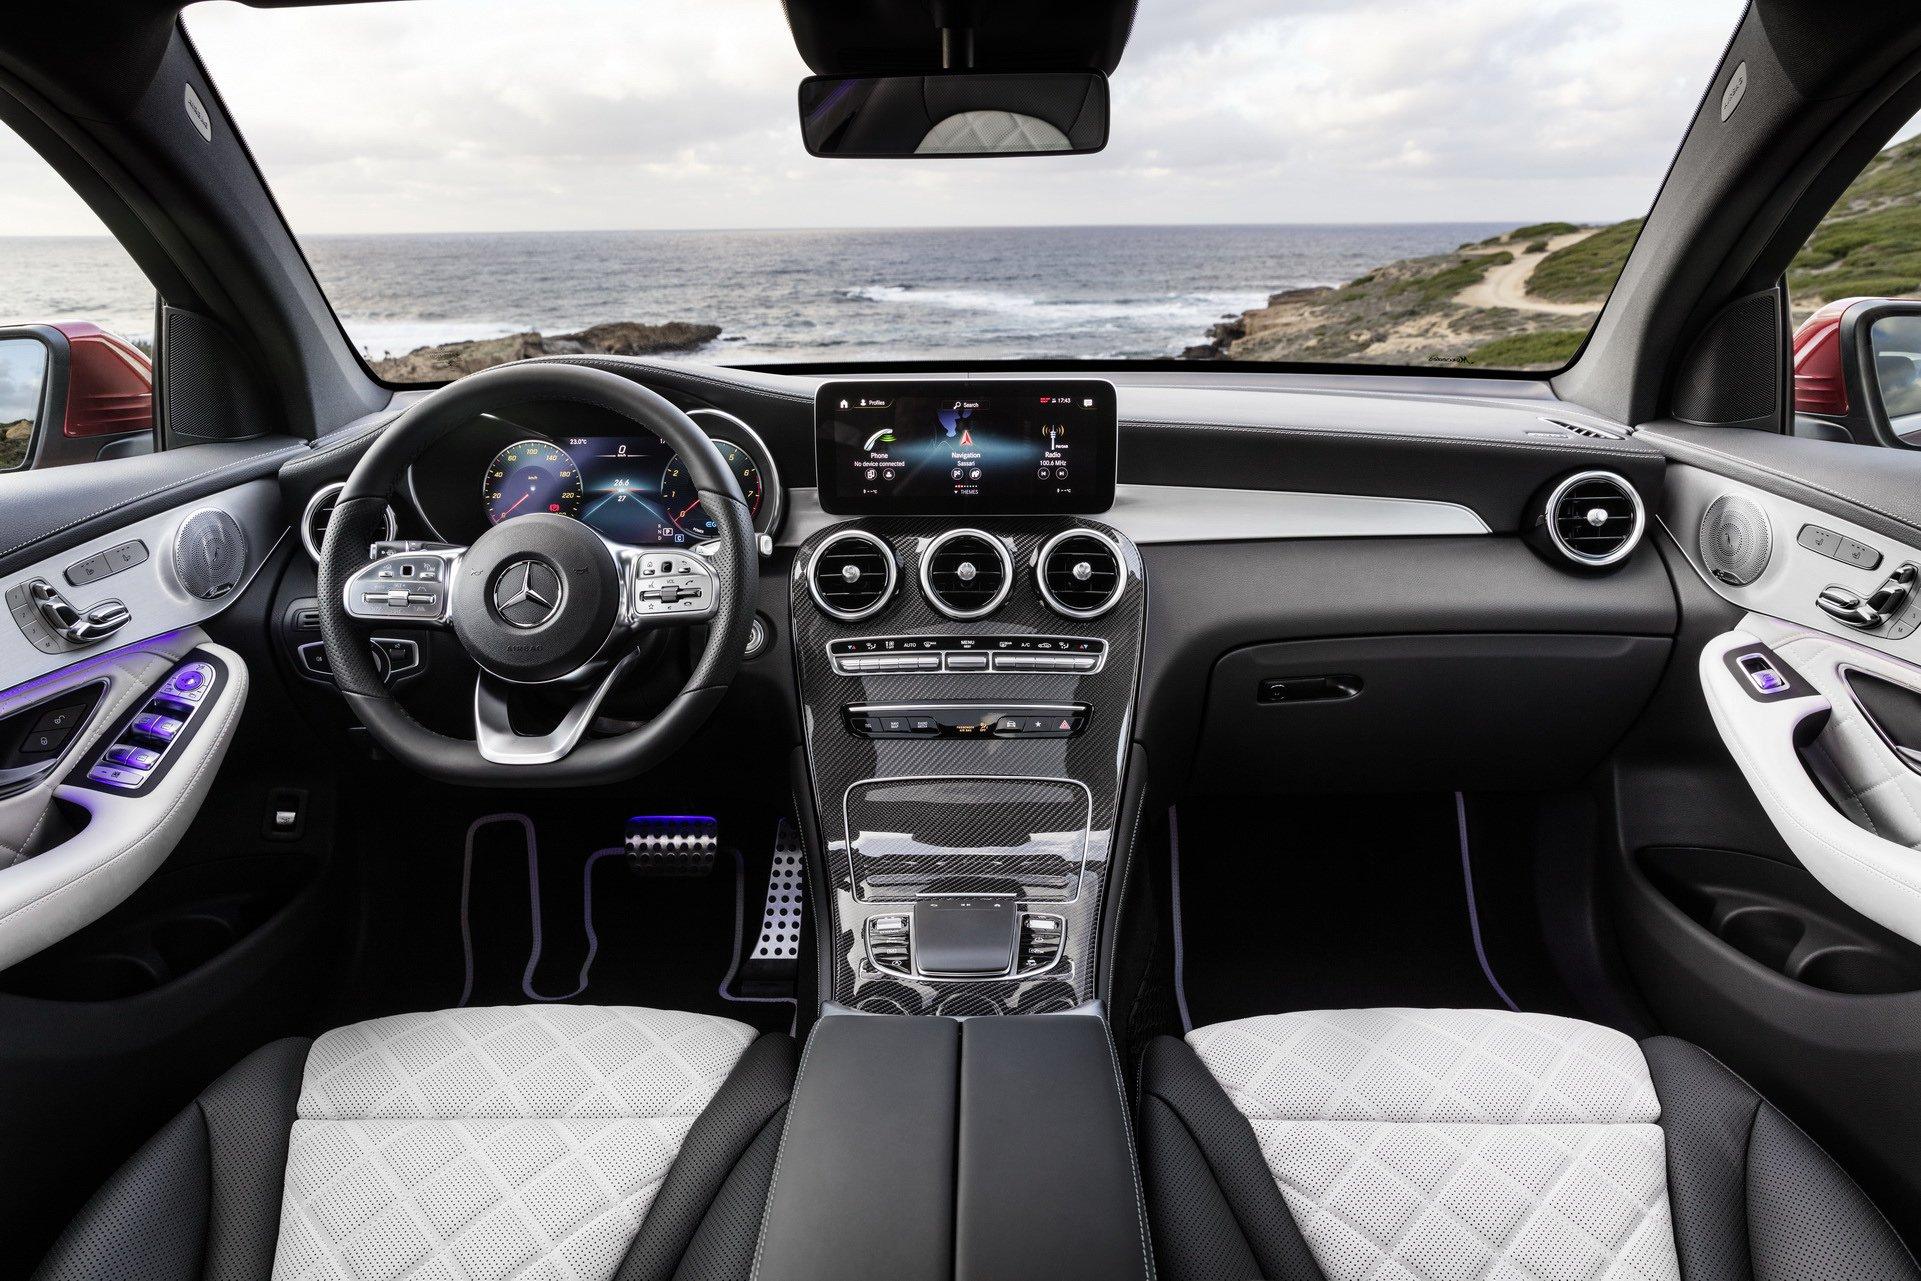 2020-mercedes-benz-glc-coupe-8.jpg